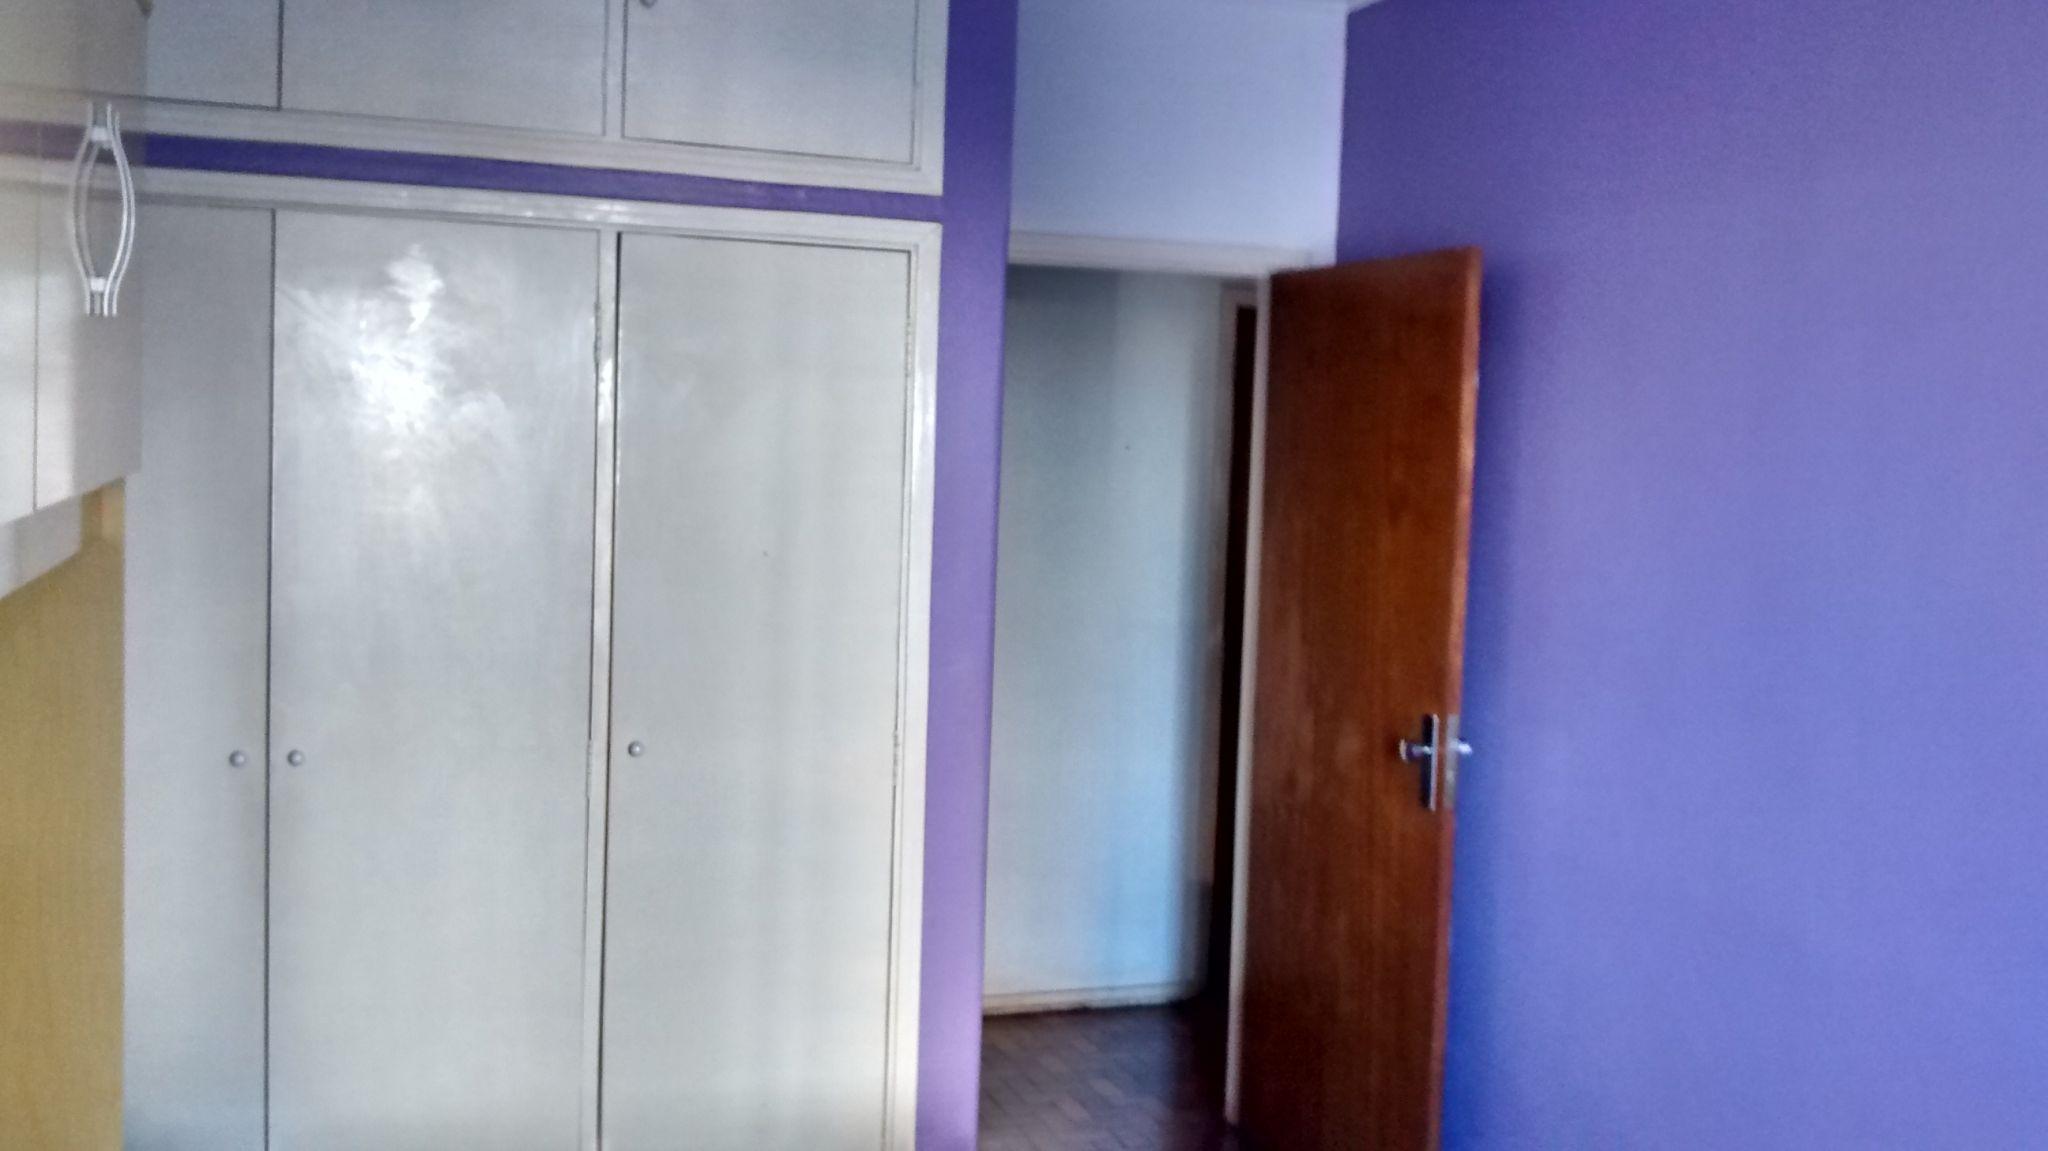 279 - Apto Centro 102 m²